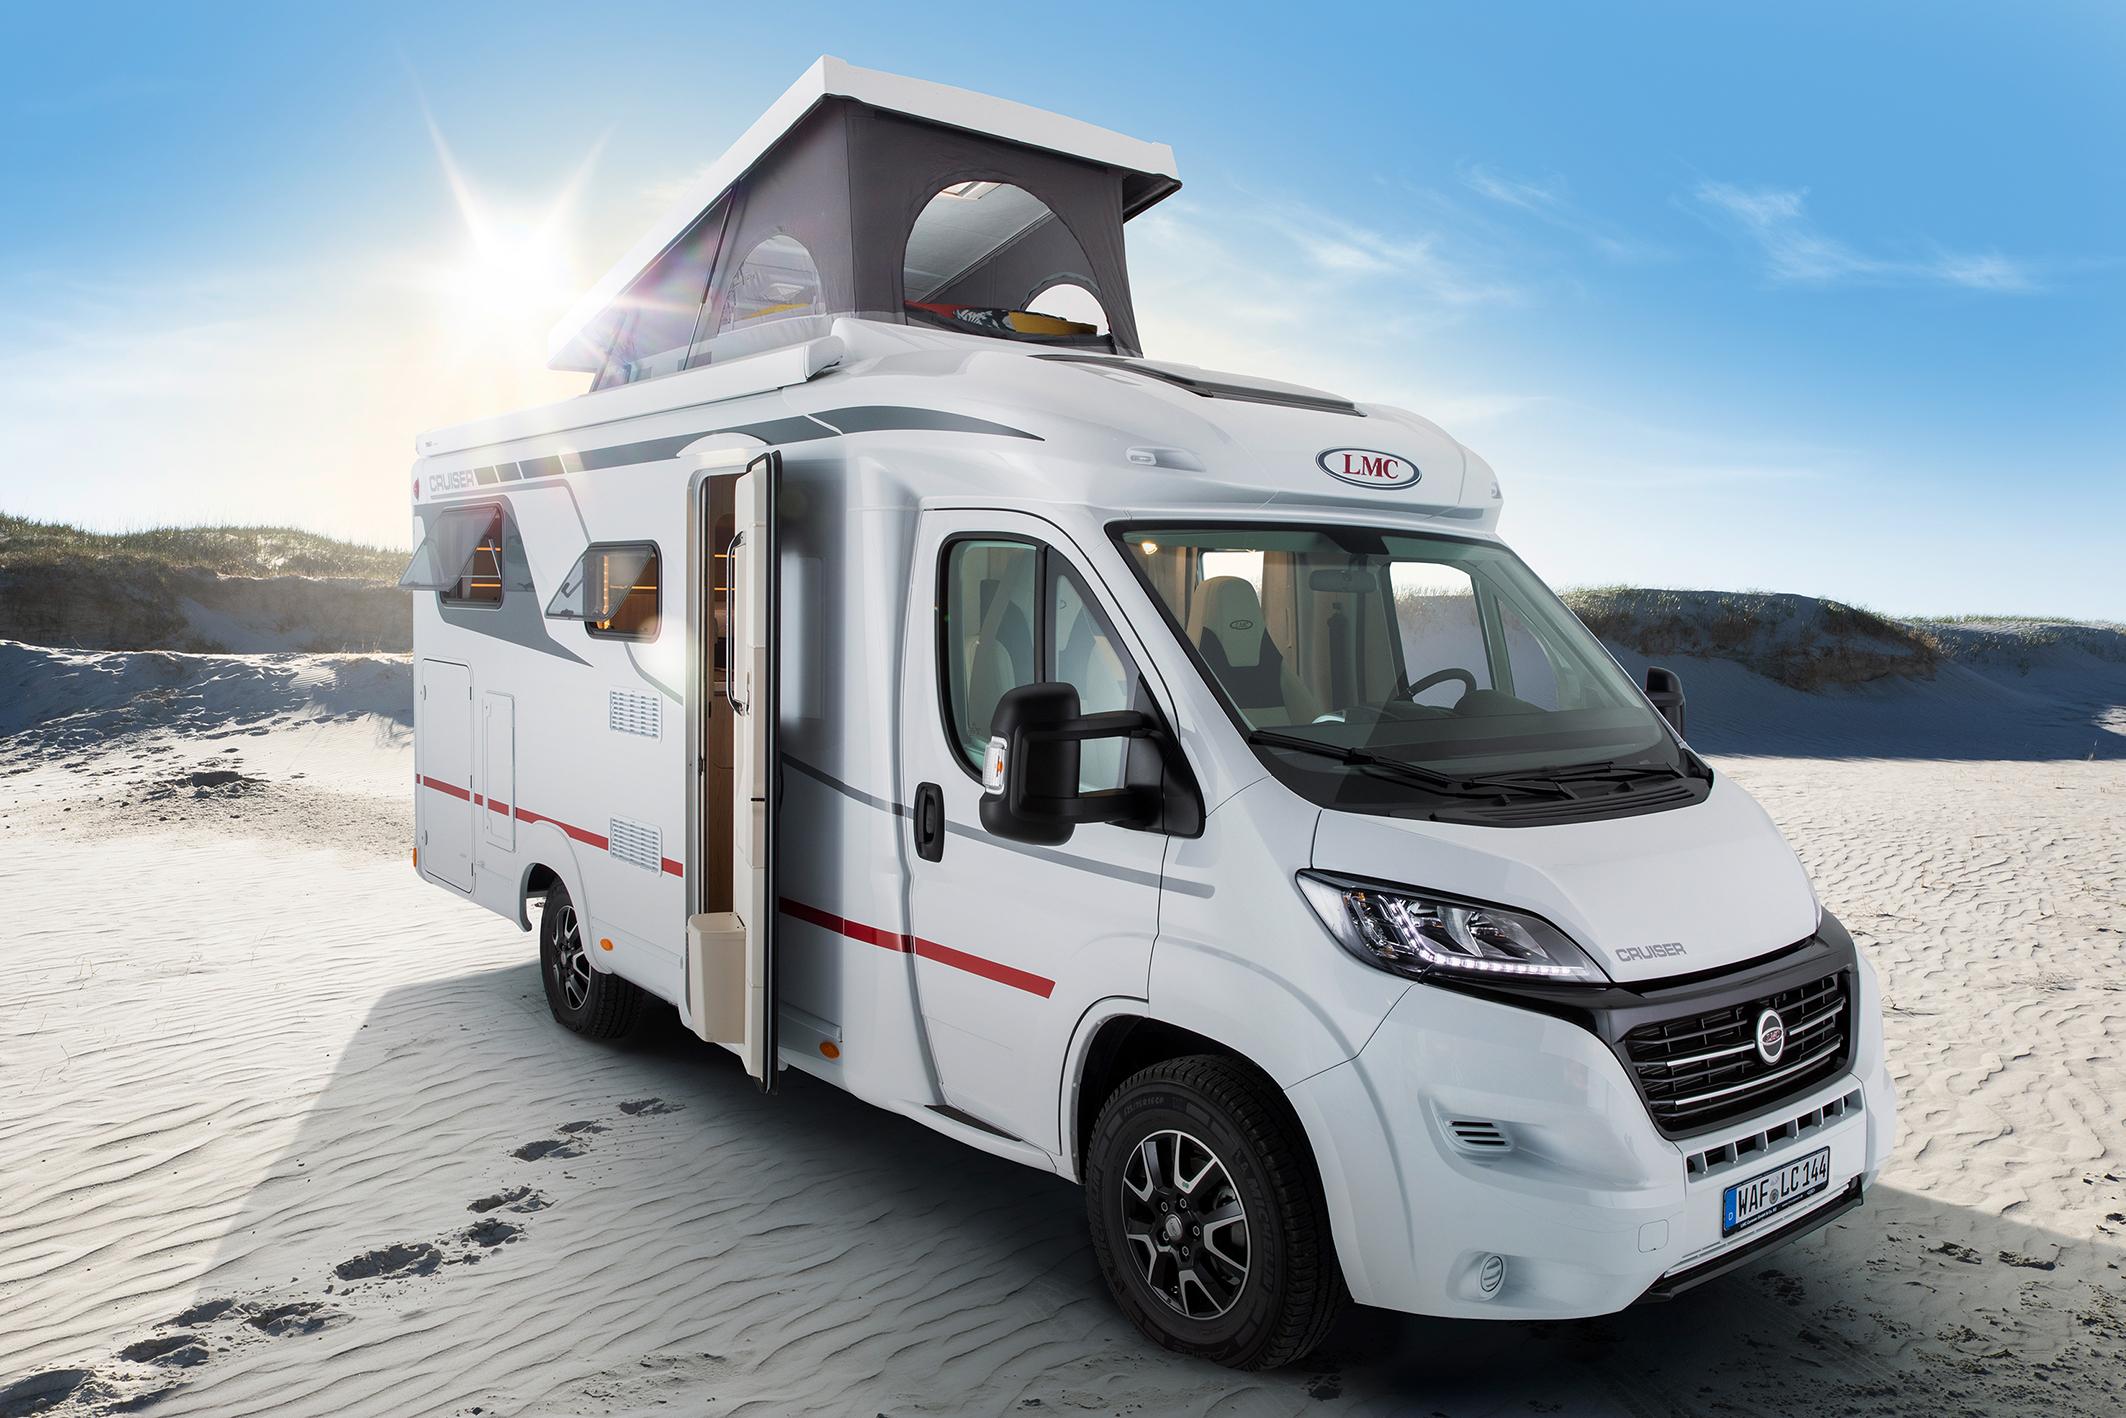 camping car LMC Cruiser V 646 G